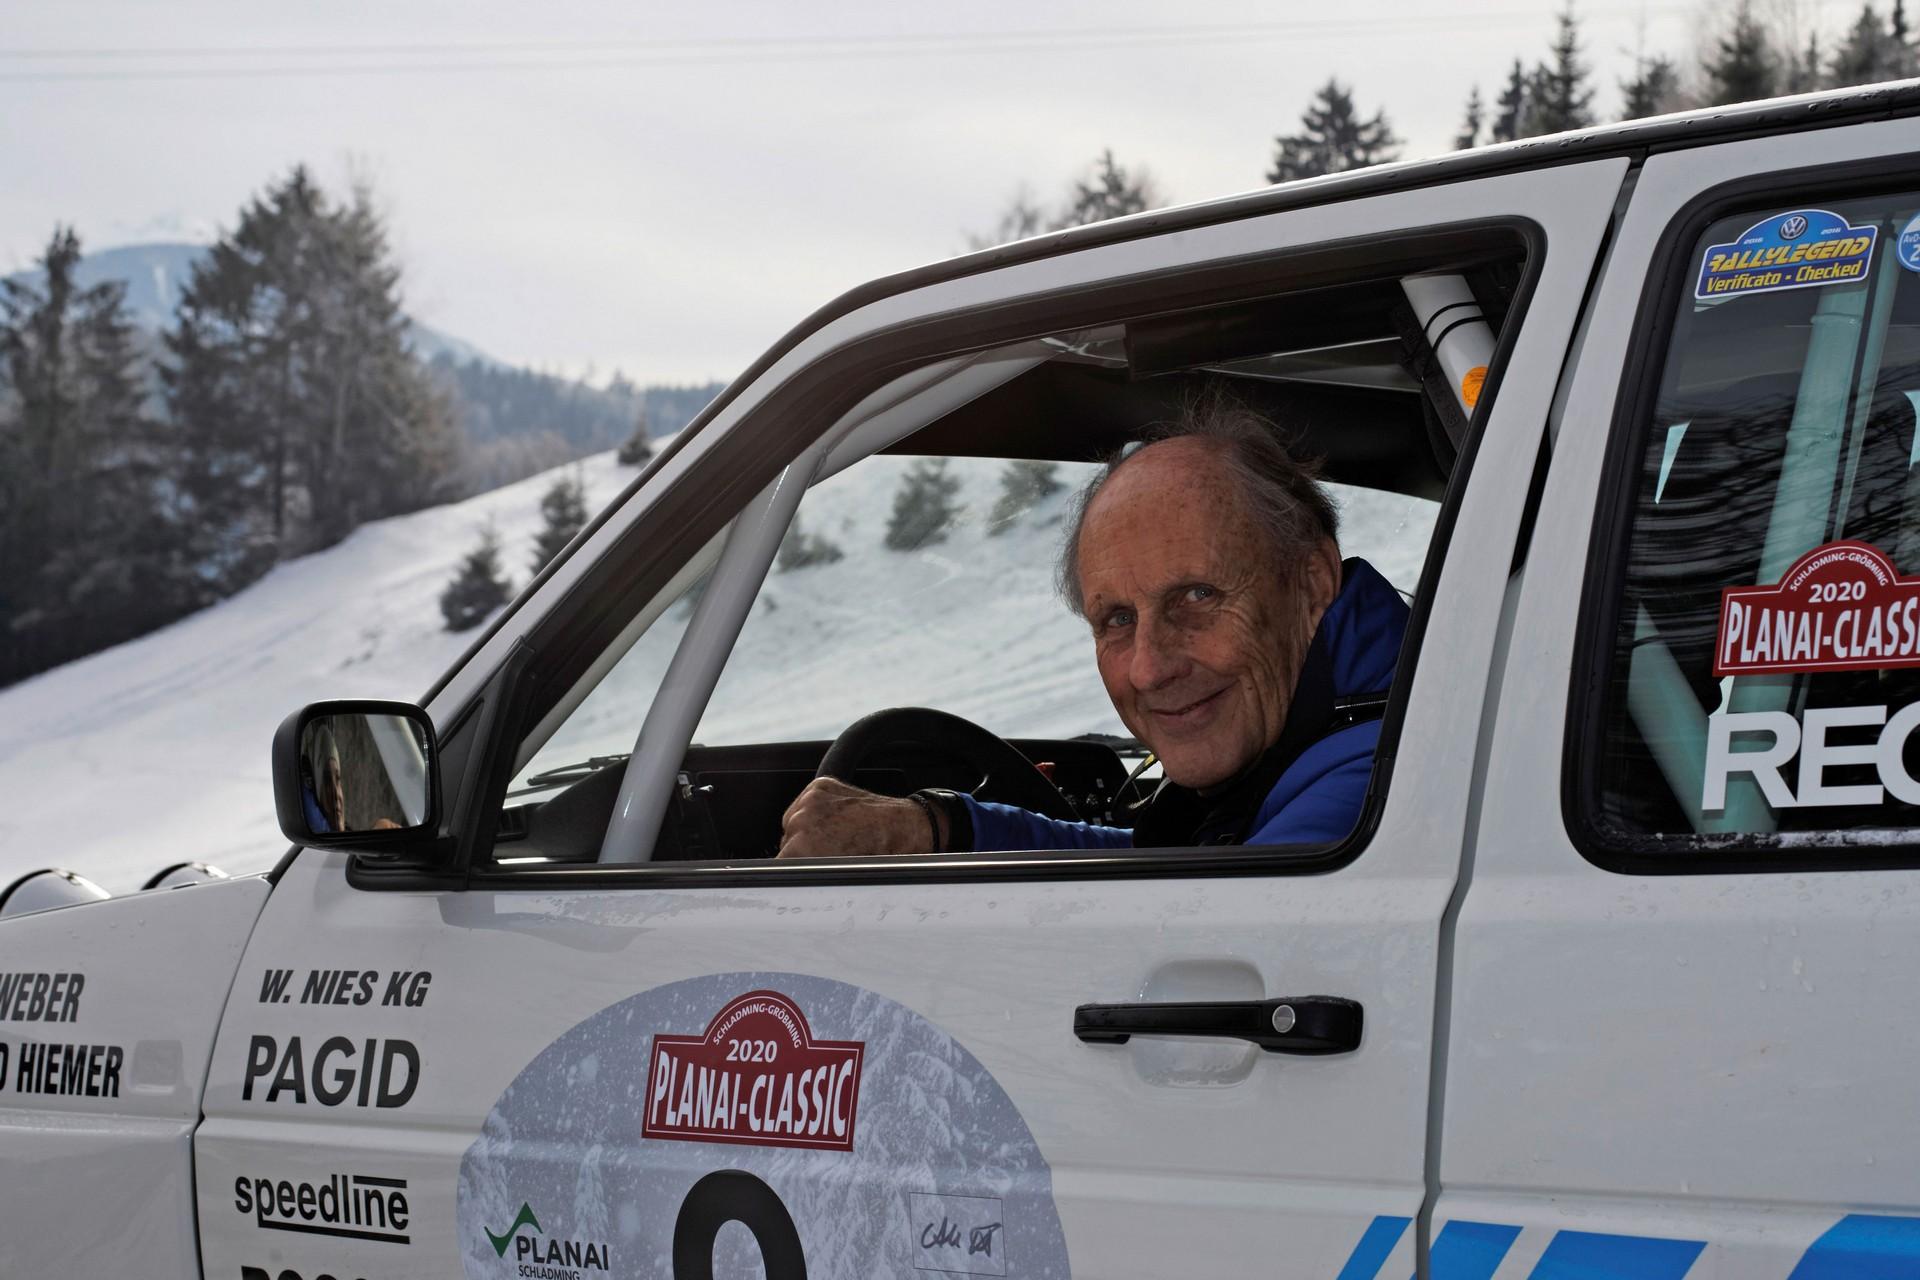 VW-GP-Ice-Race-2020-7